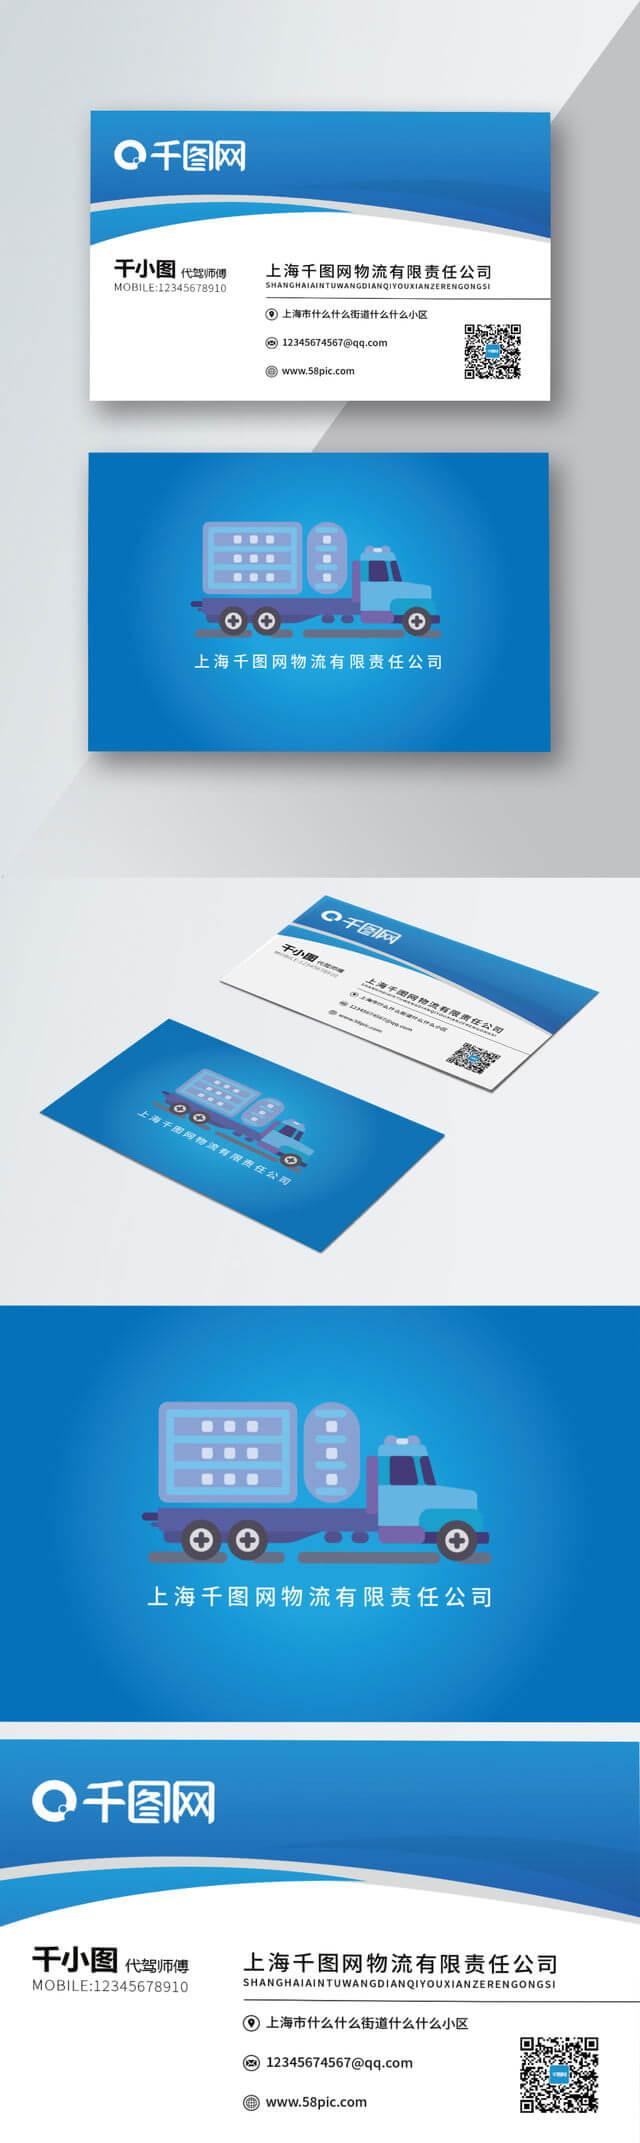 Logistics Company Business Card Vector Material Logistics Inside Transport Business Cards Templates Free